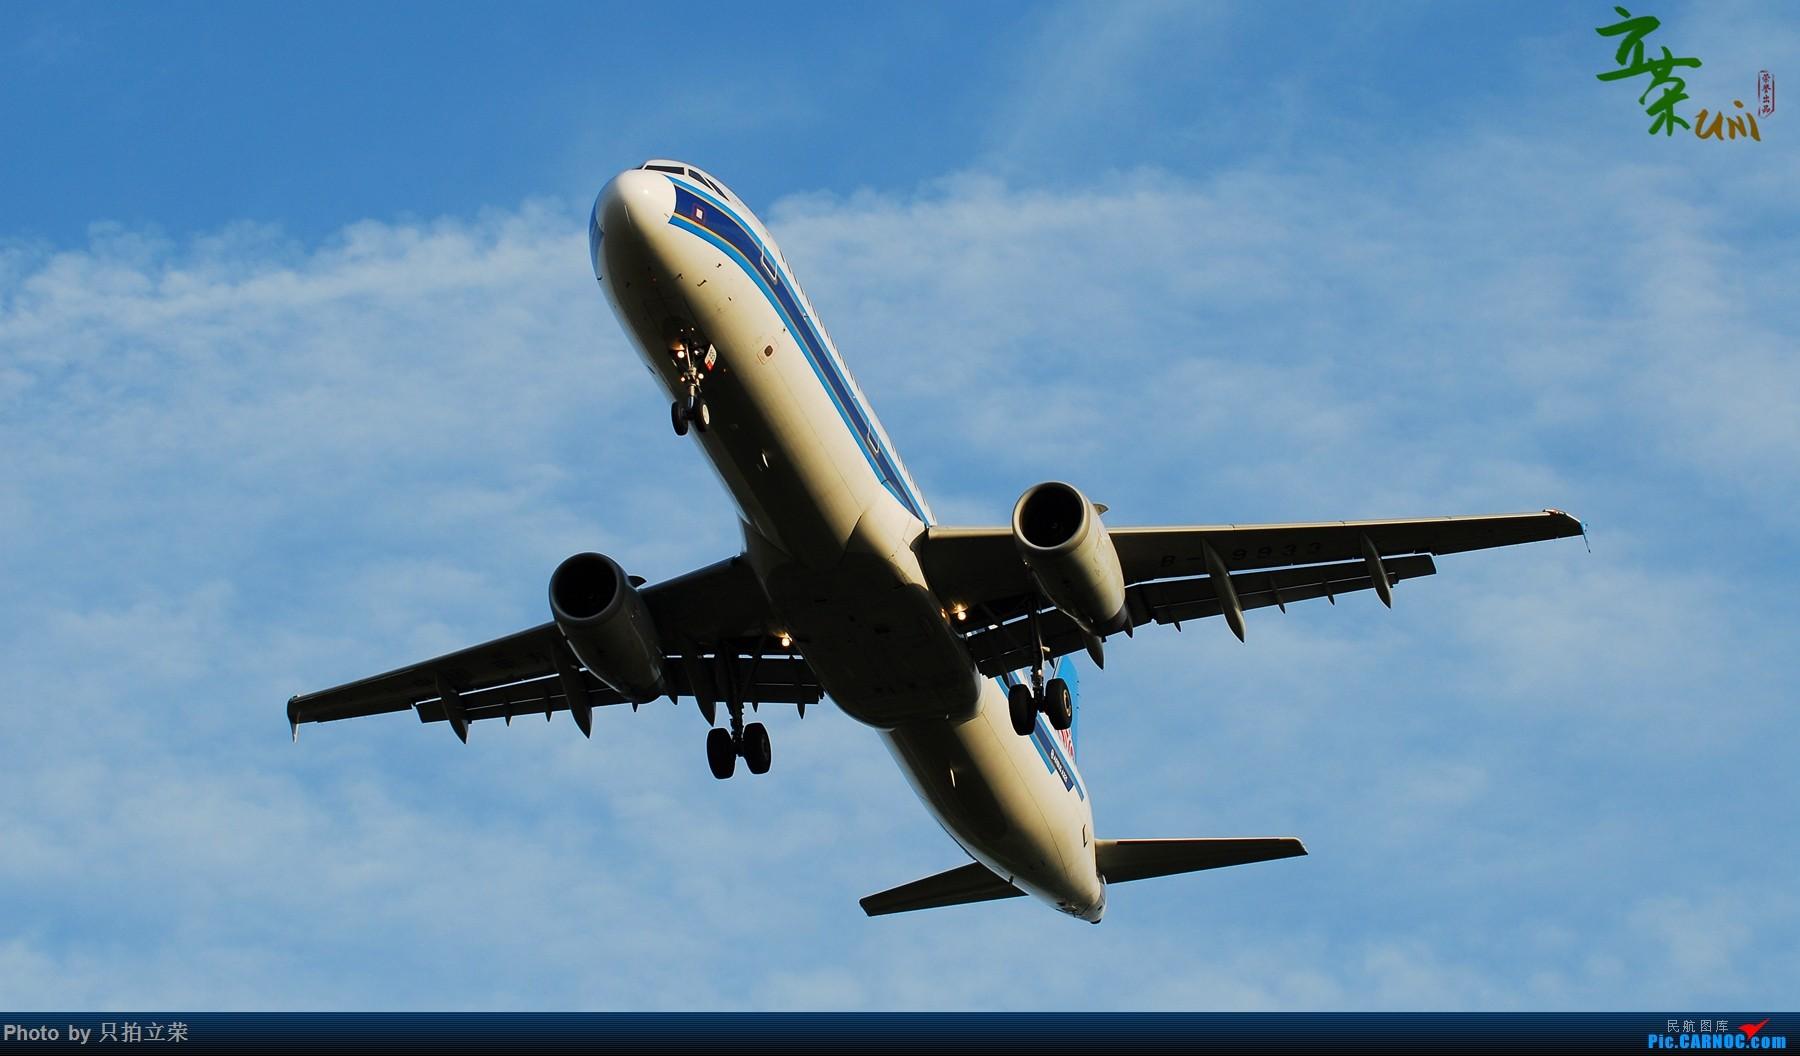 Re:[原创]长沙黄花的黄昏真的美 AIRBUS A321-200 B-9933 中国长沙黄花国际机场